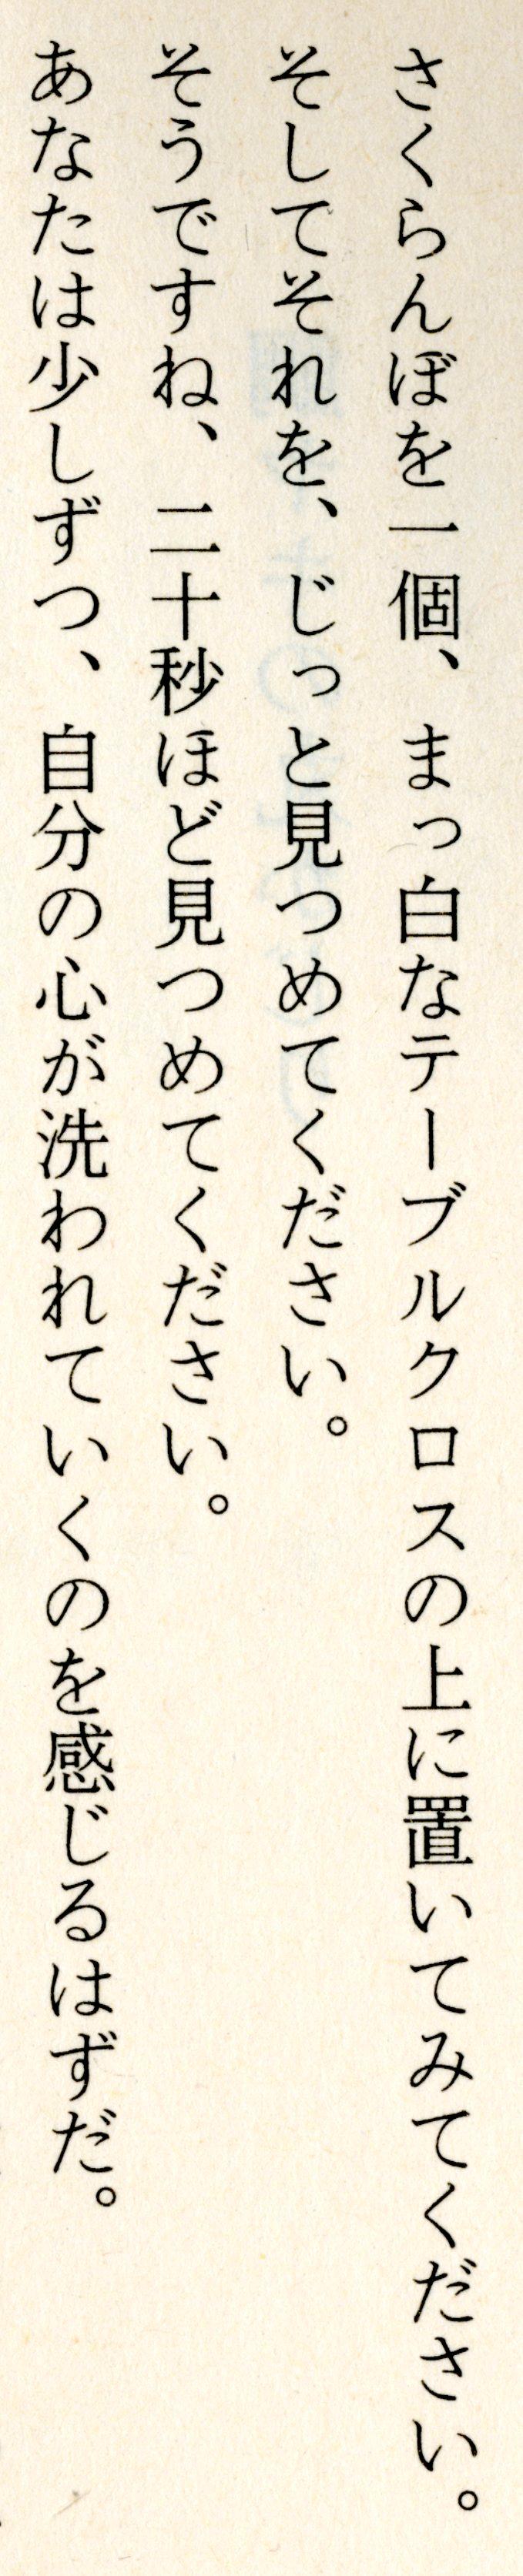 essay about japanese language